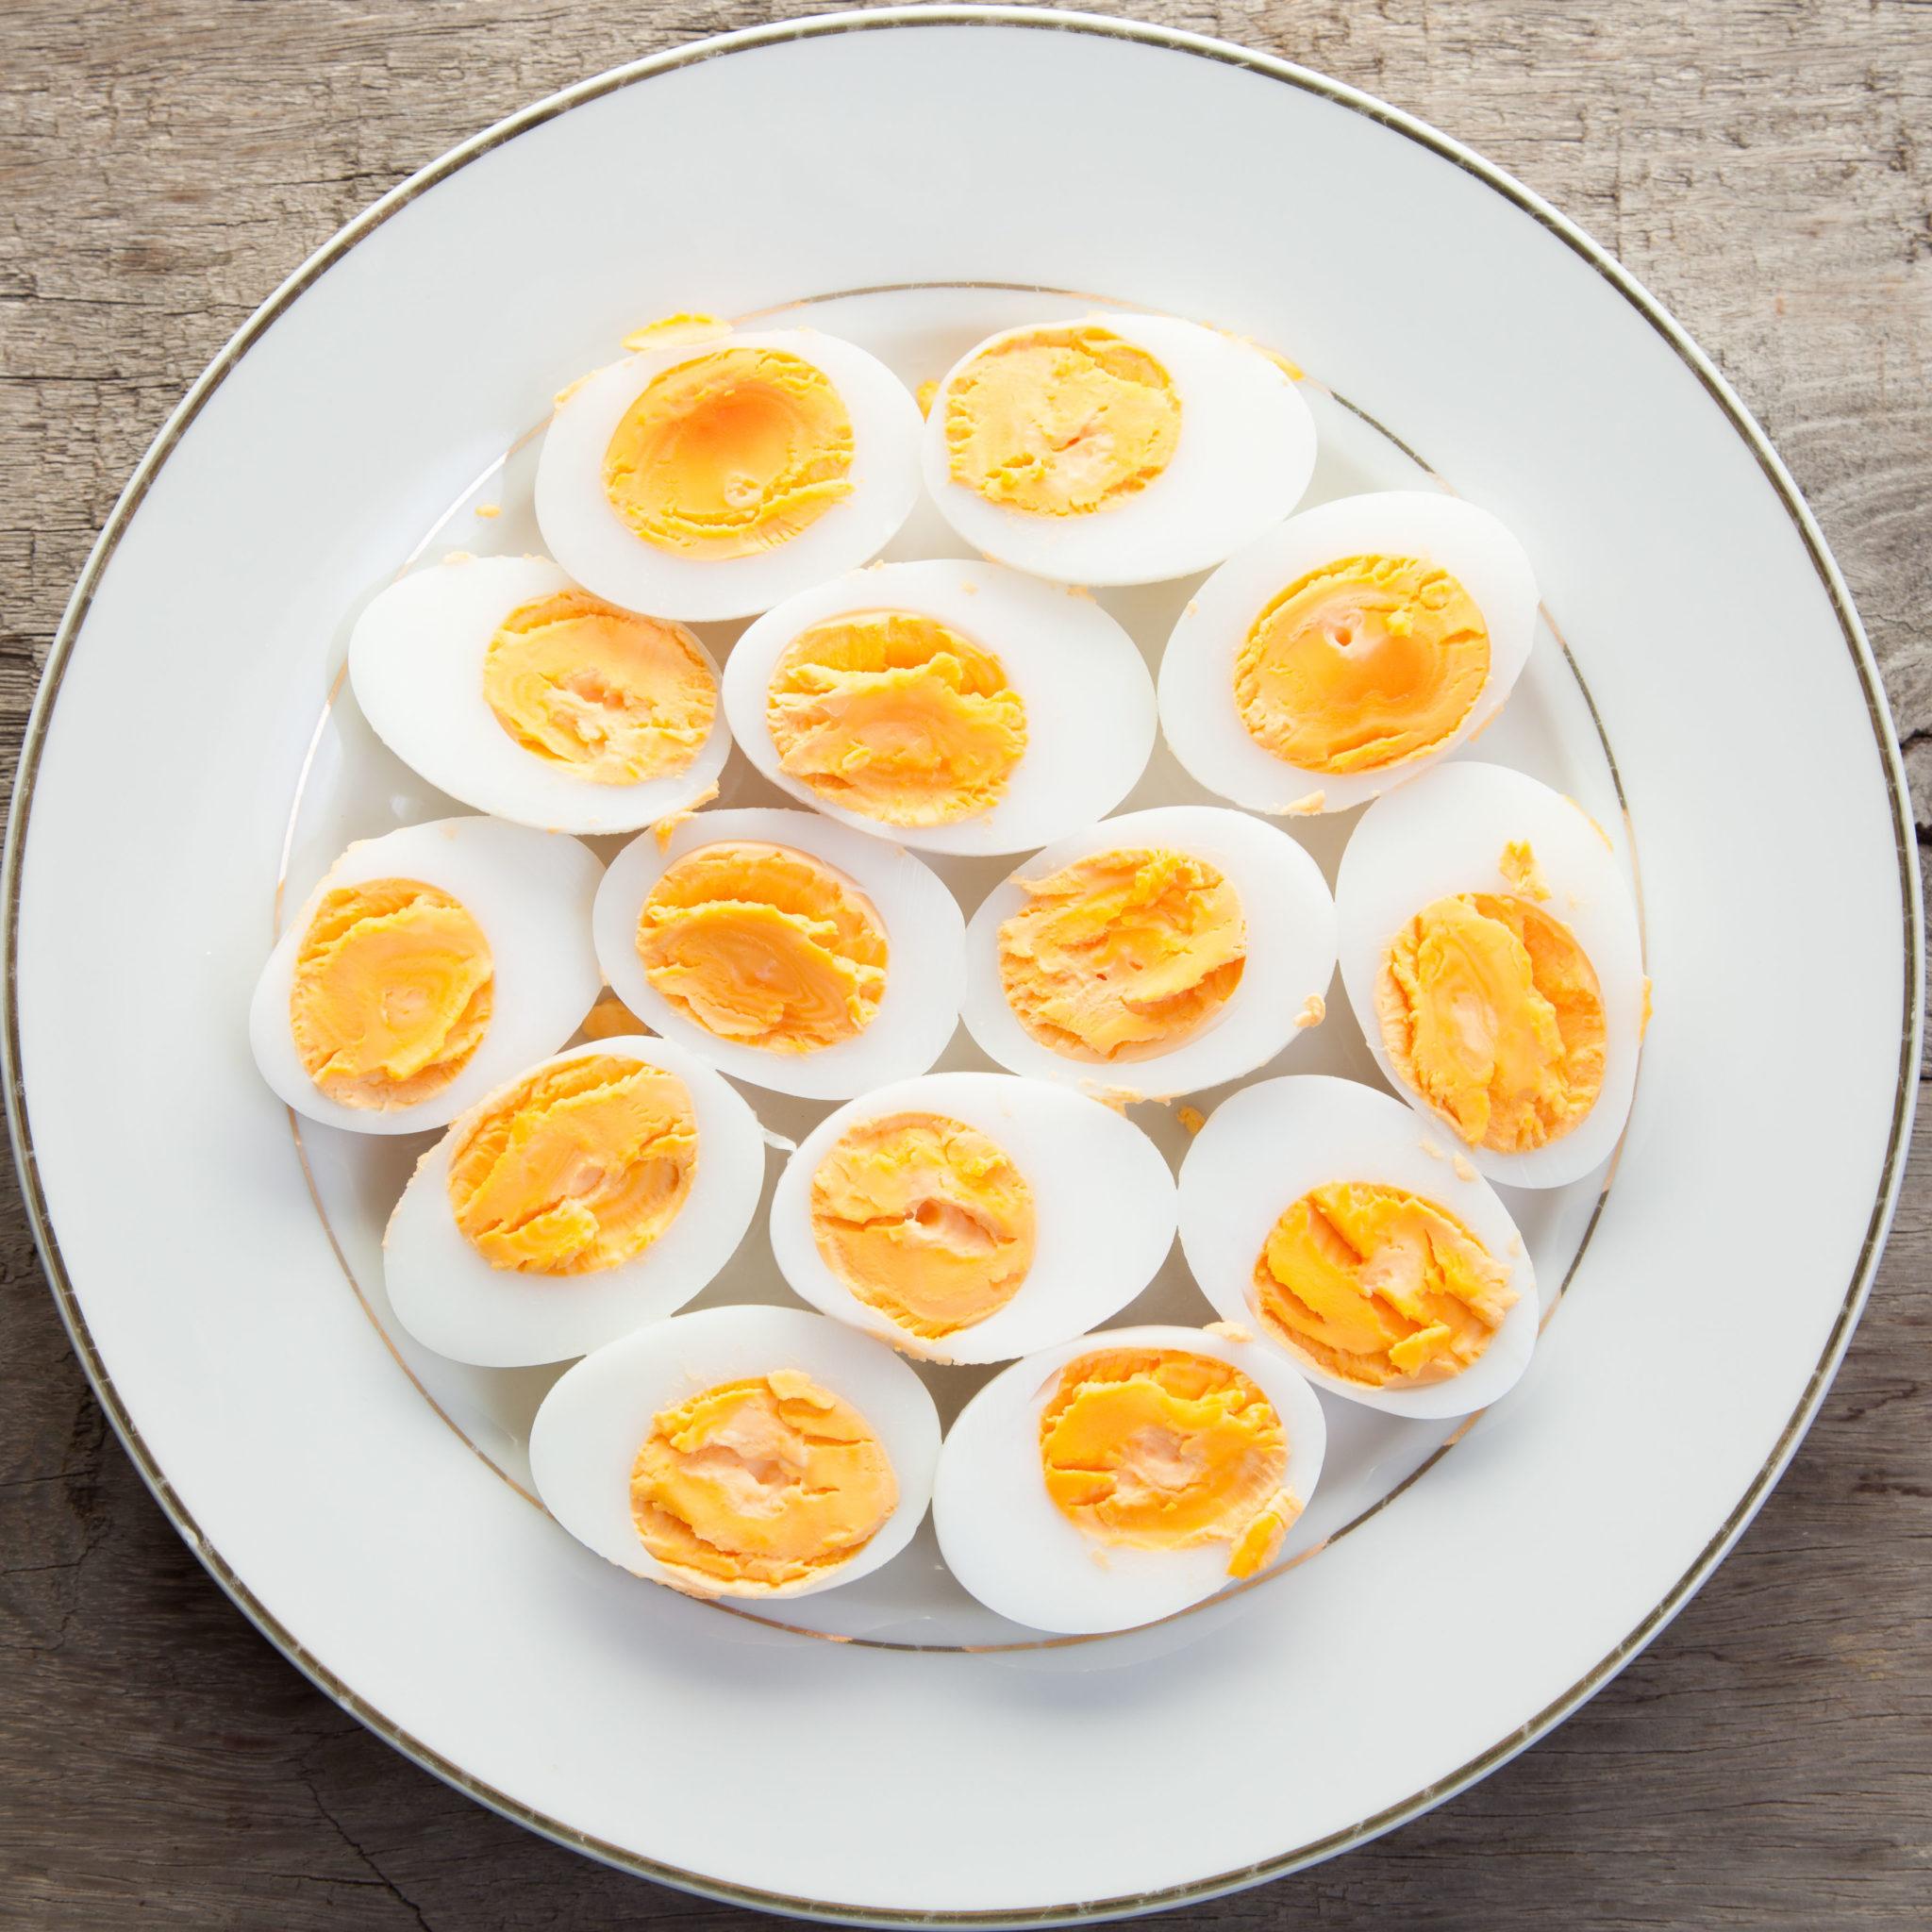 instant pot, instant pot recipes, instant pot eggs